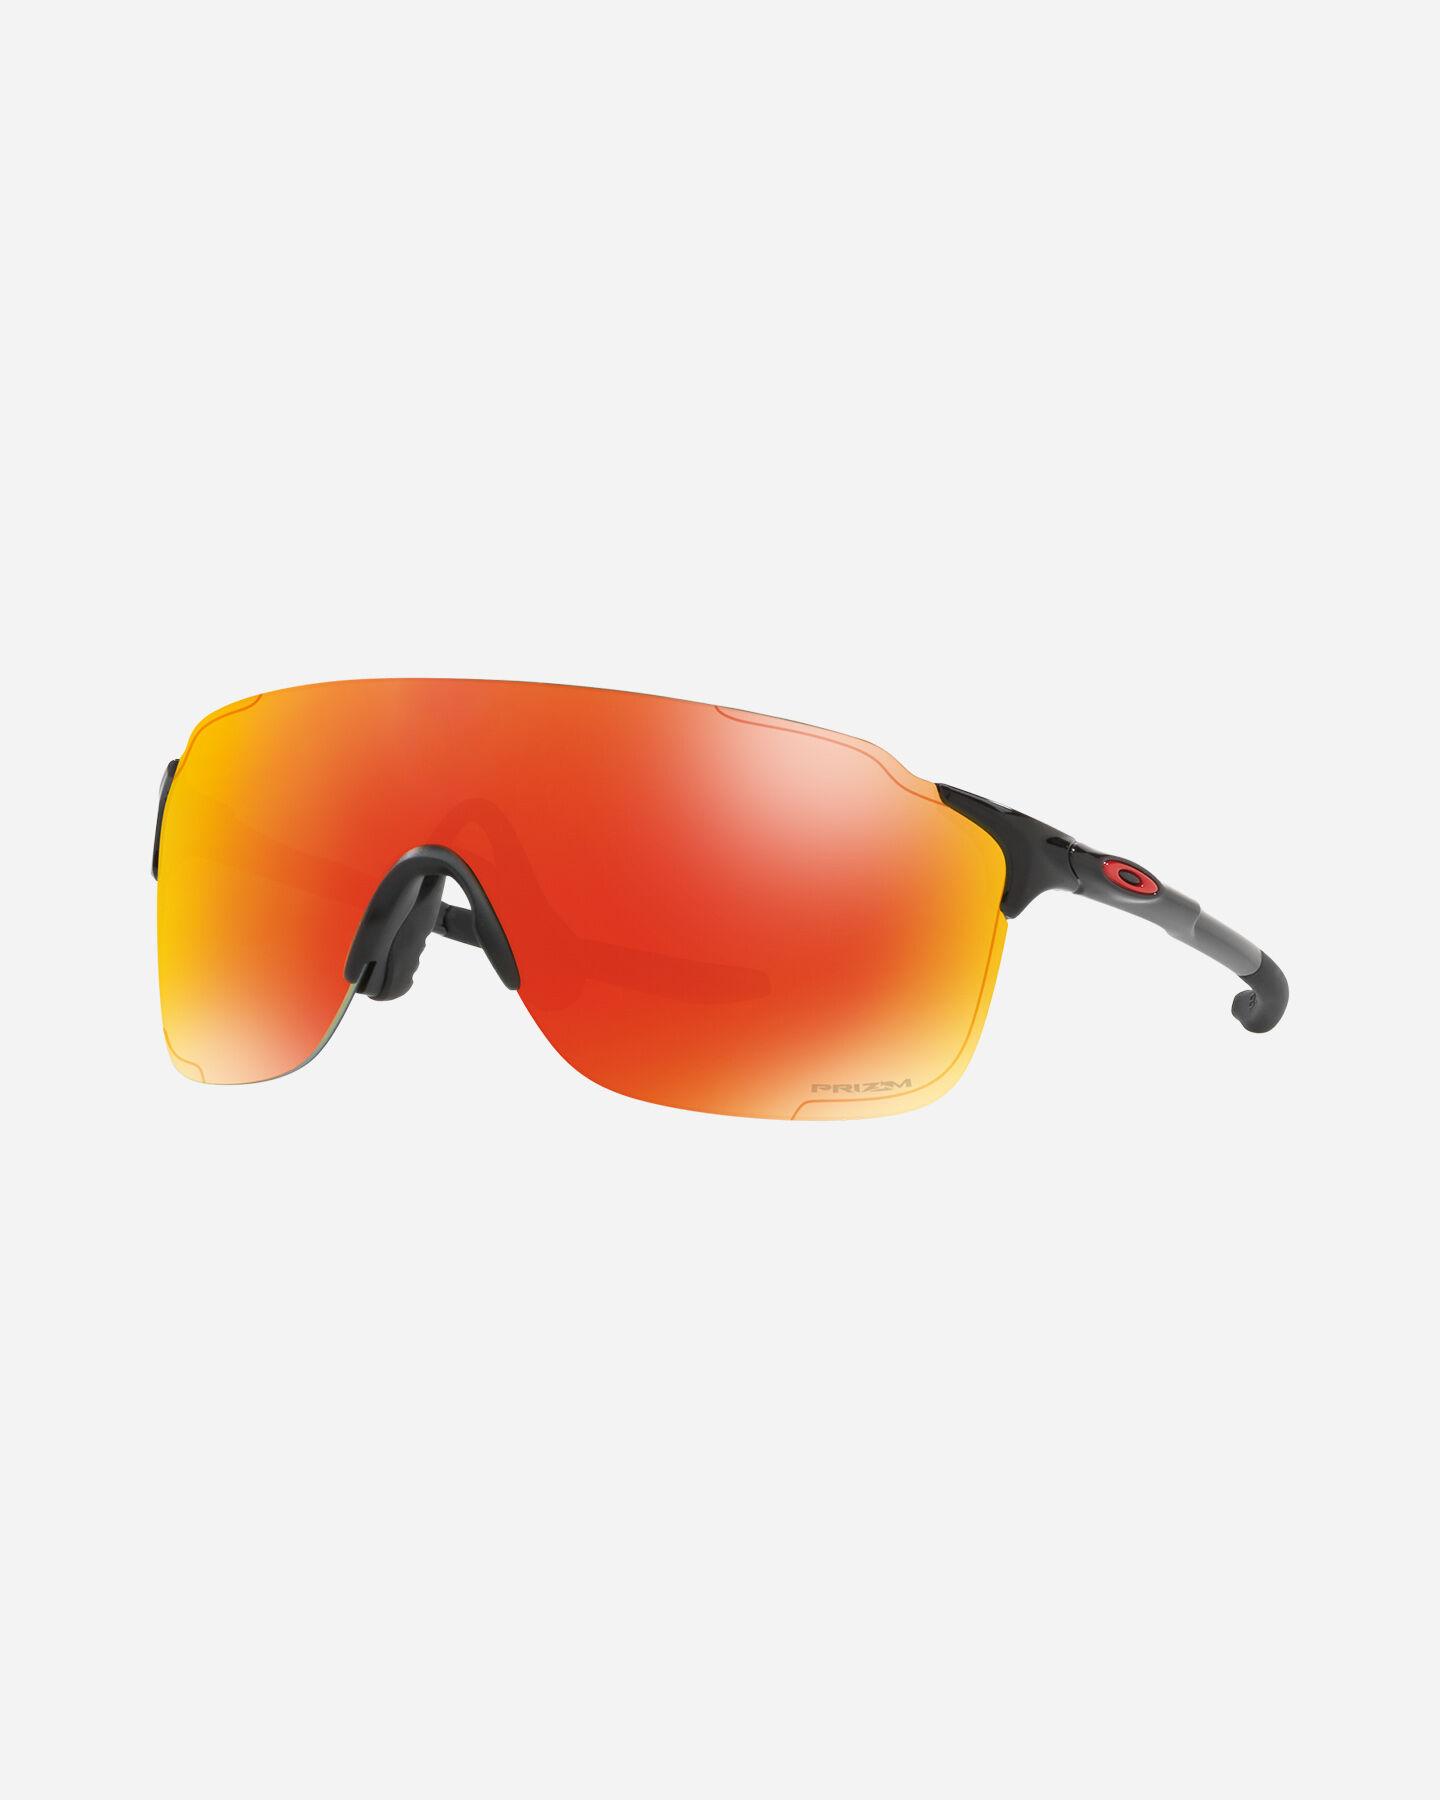 occhiali oakley a torino